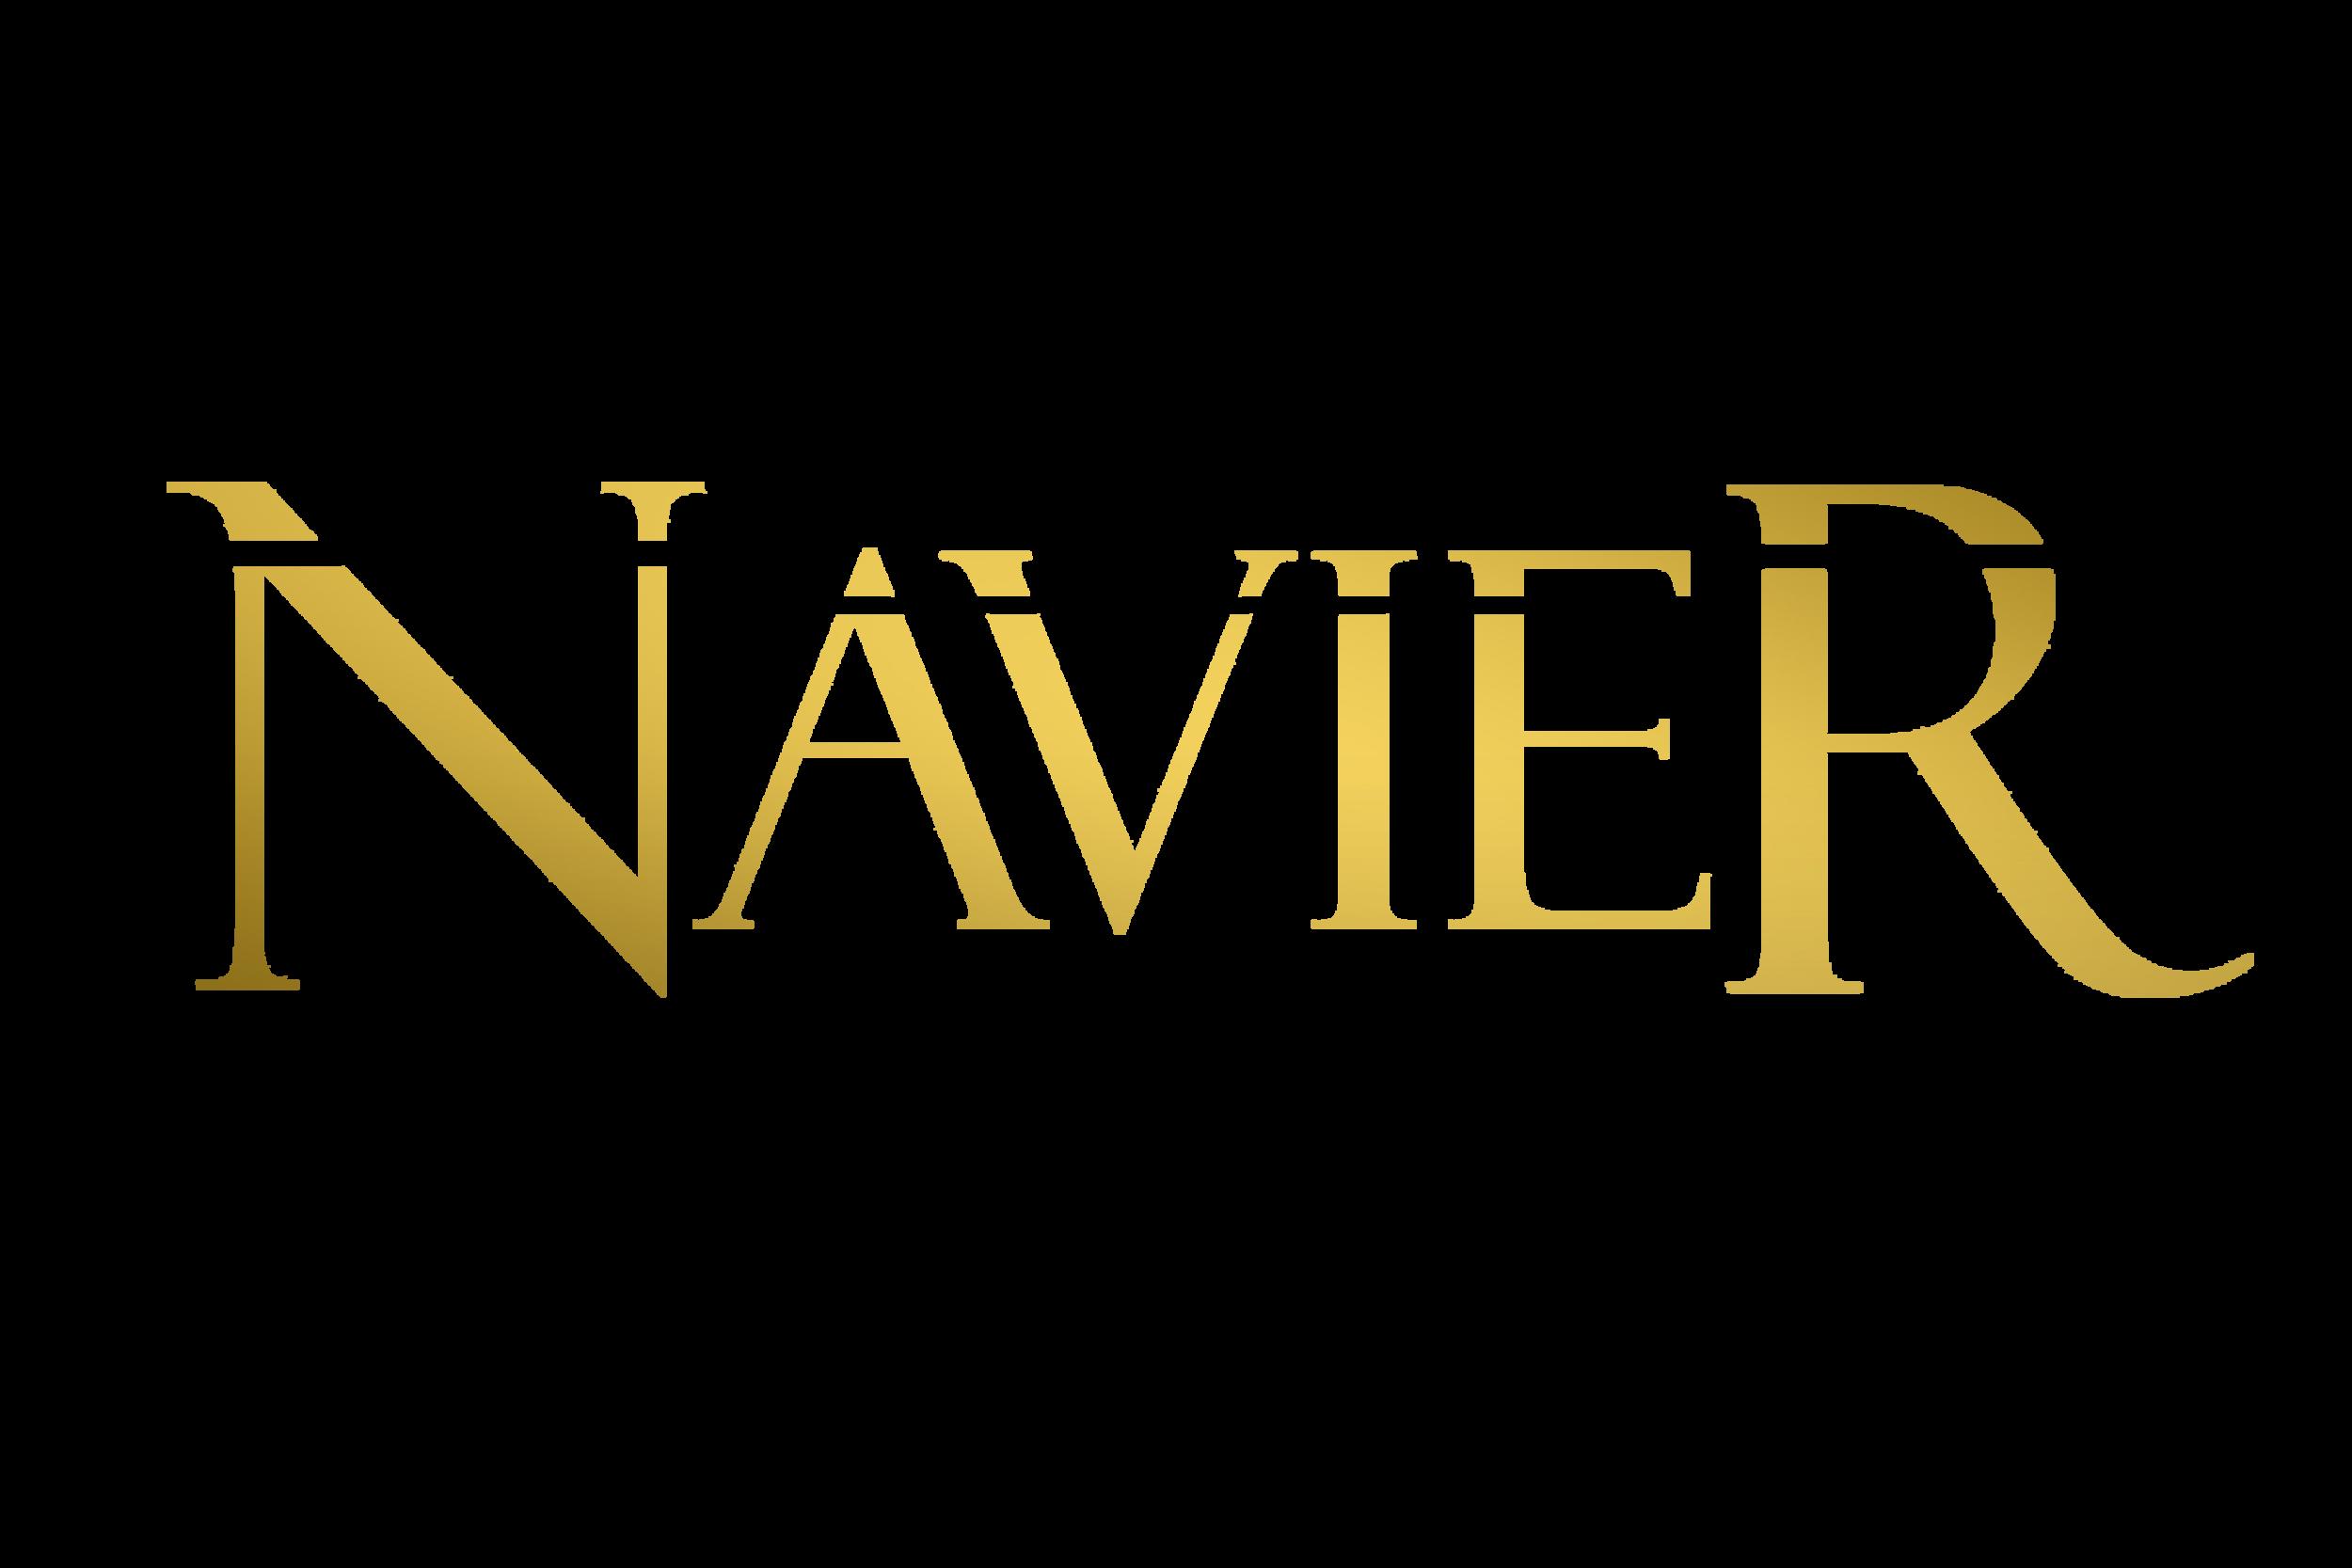 navier 2012 script gold.png